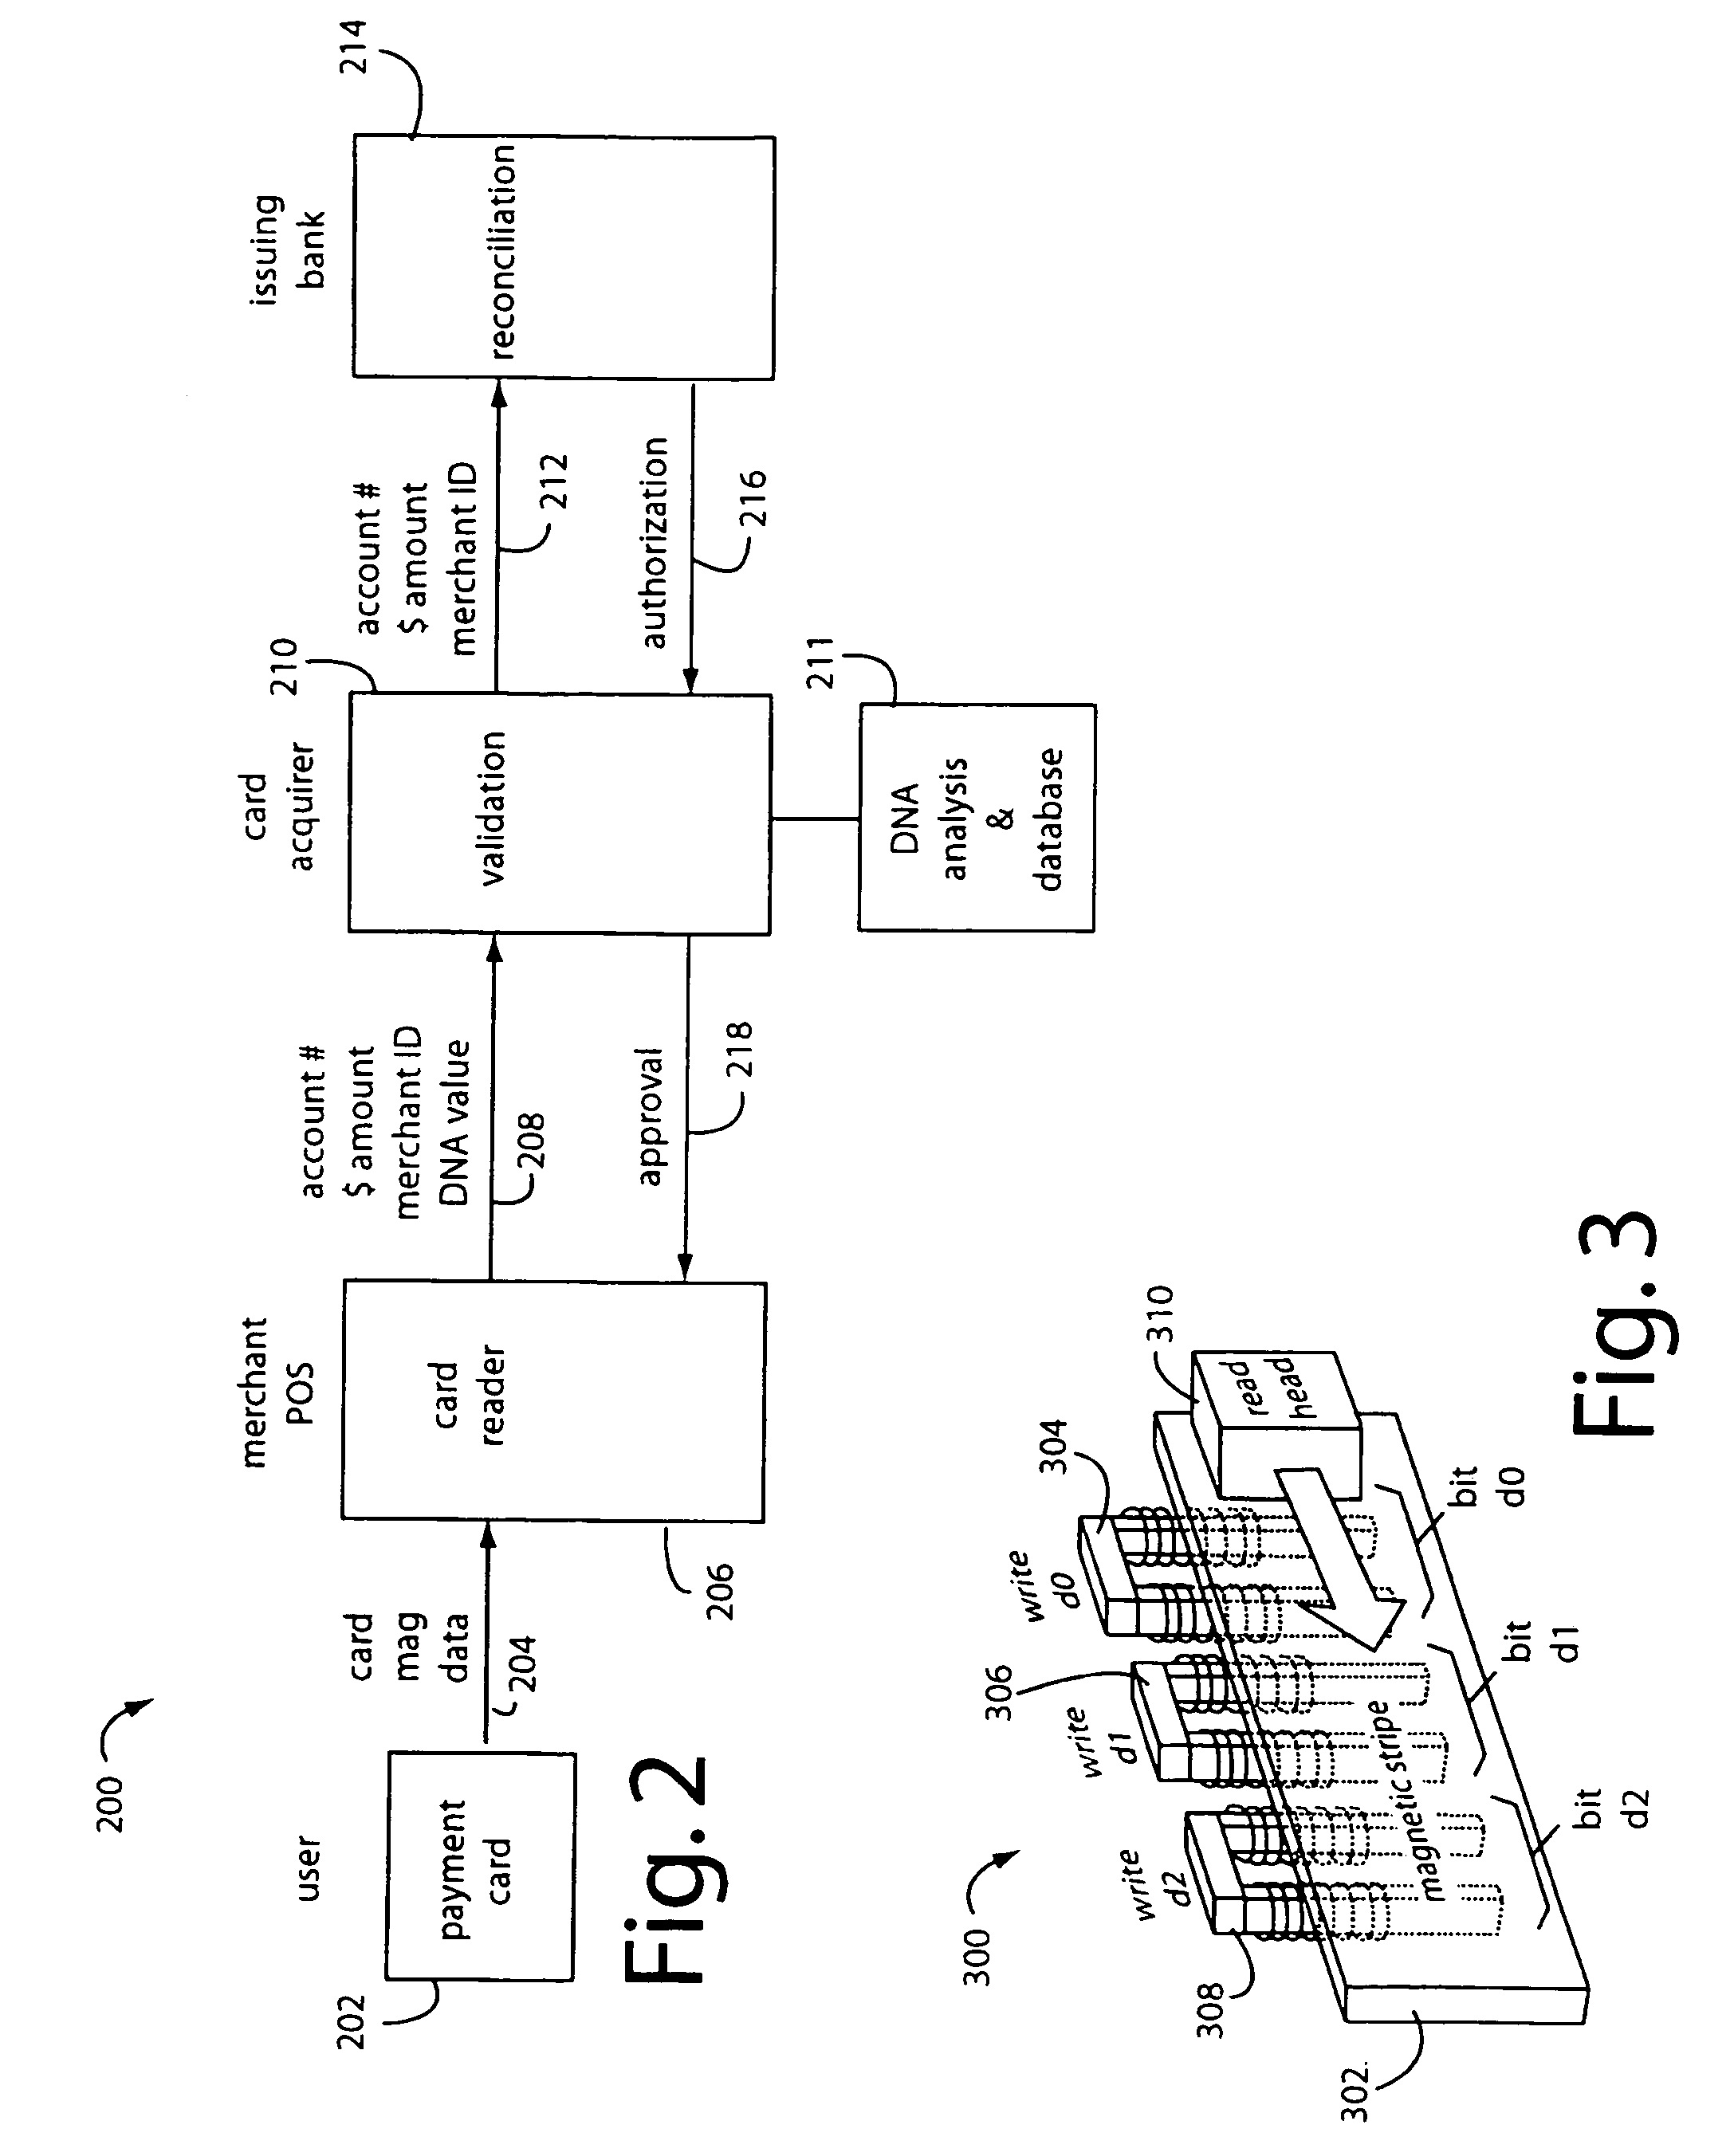 Magnetic Card Wiring Diagram Dodge Caravan 3 Engine